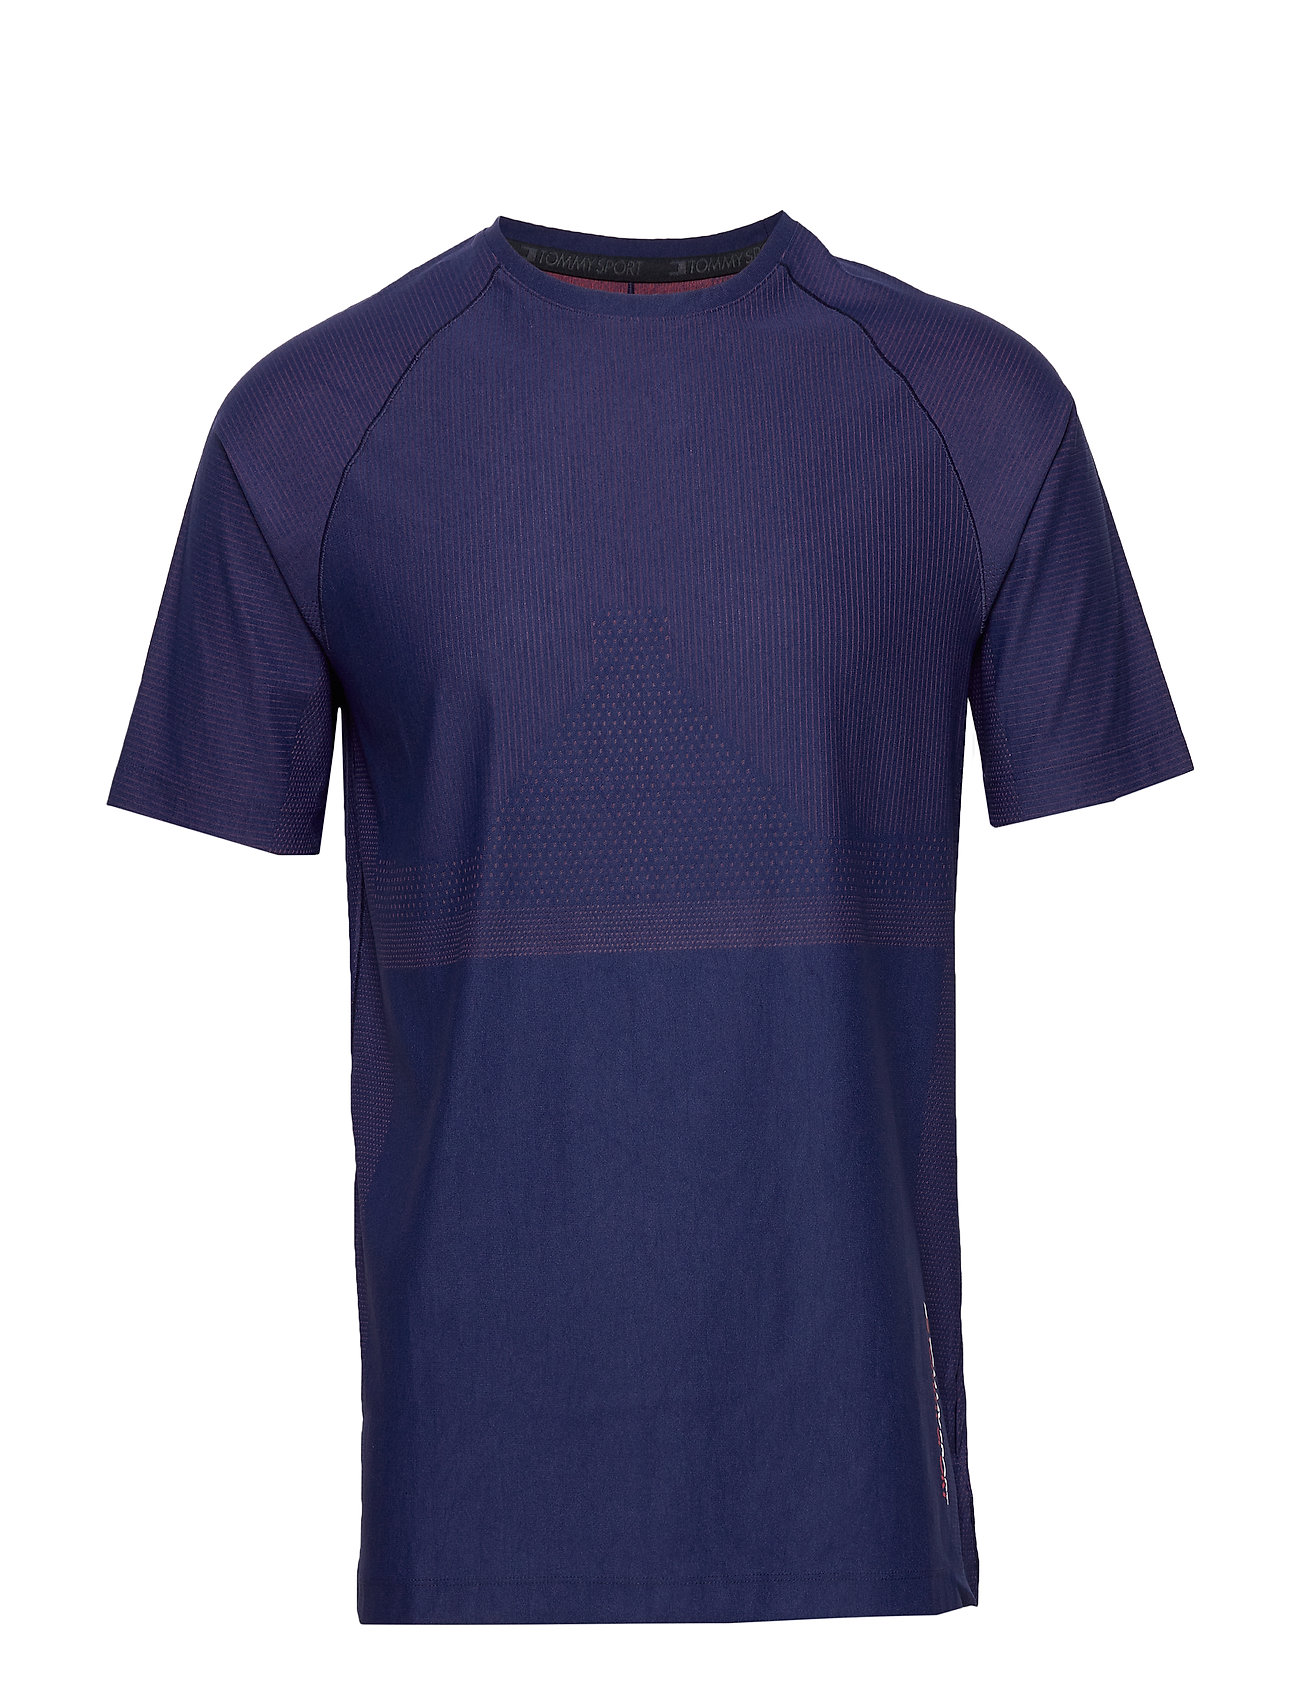 Tommy Sport WARPKNIT T-SHIRT - BLUE INK